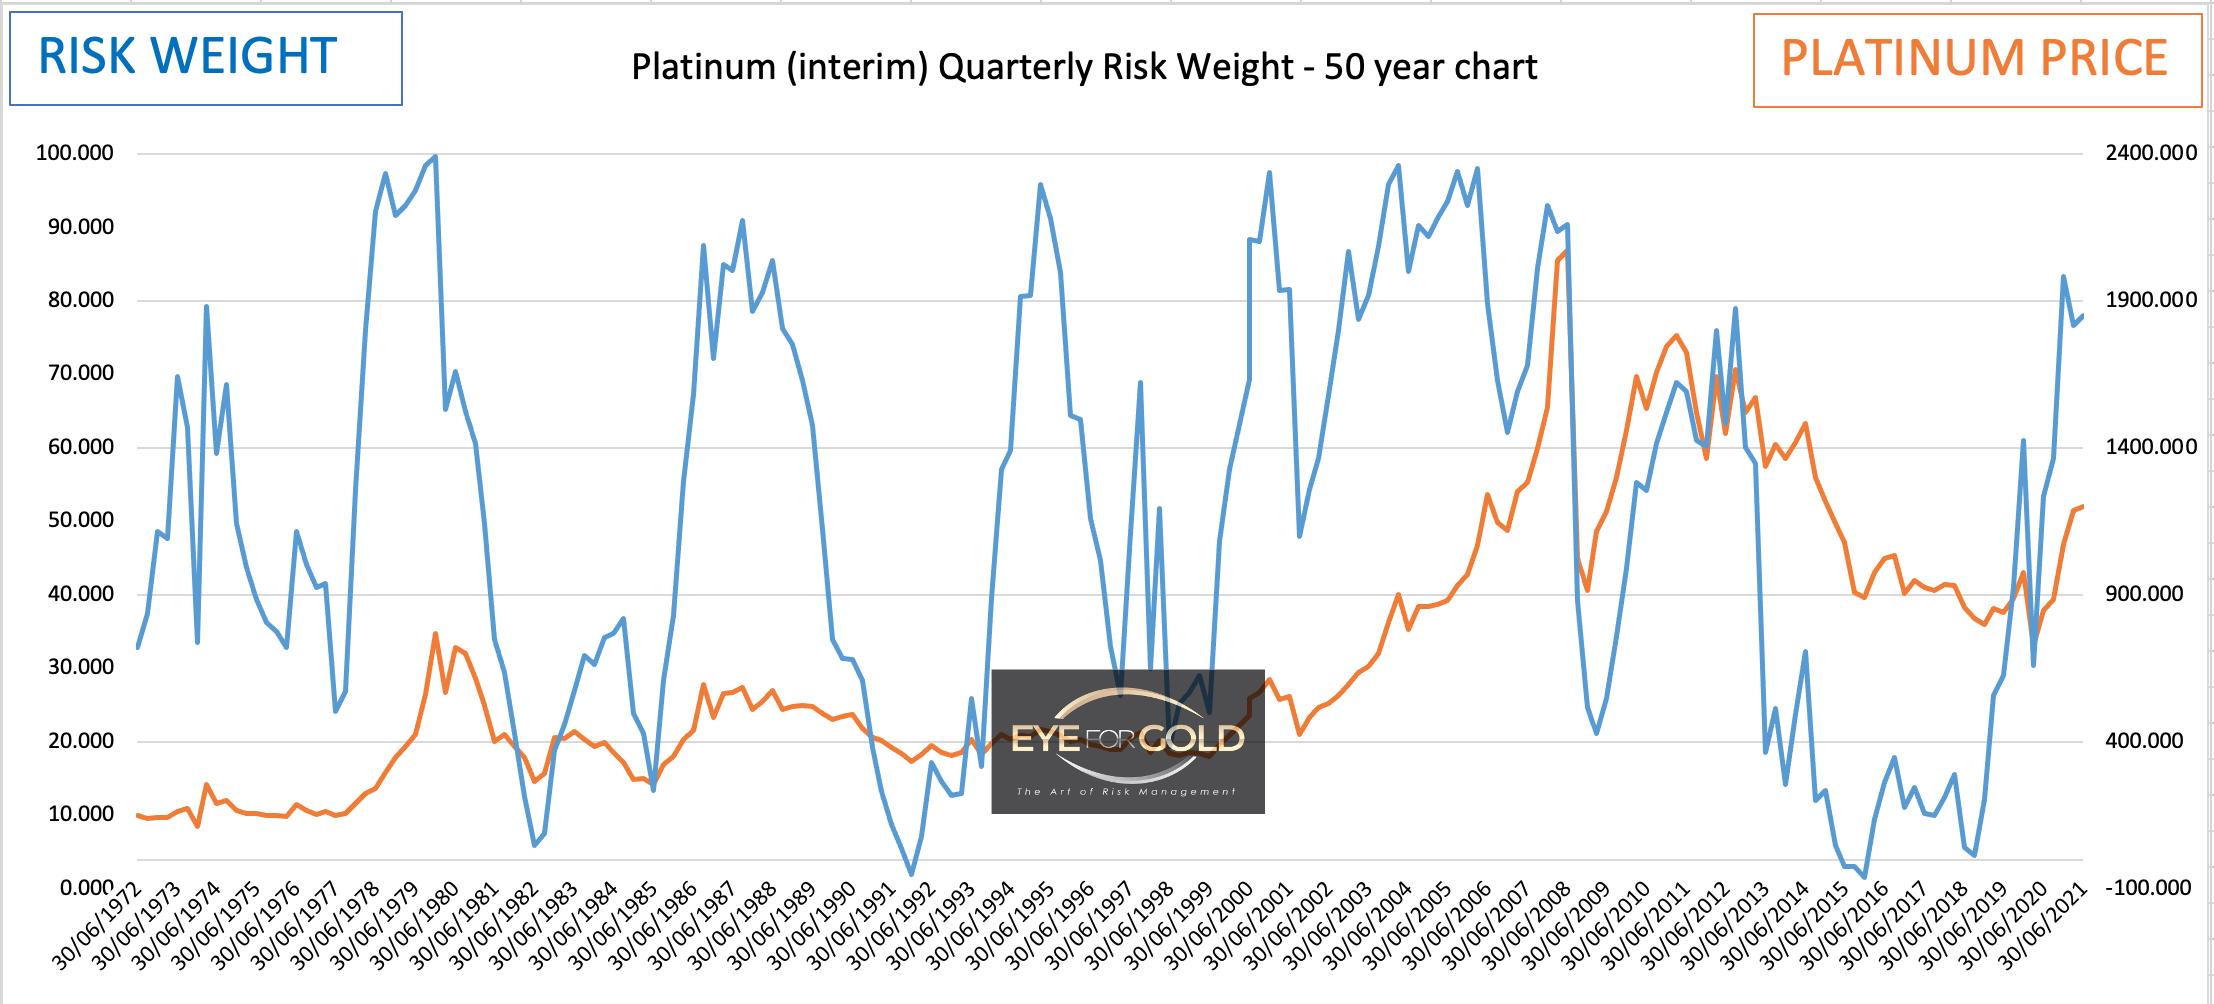 Platinum-USD-interim-quarterly-50-year-risk-chart-16042021